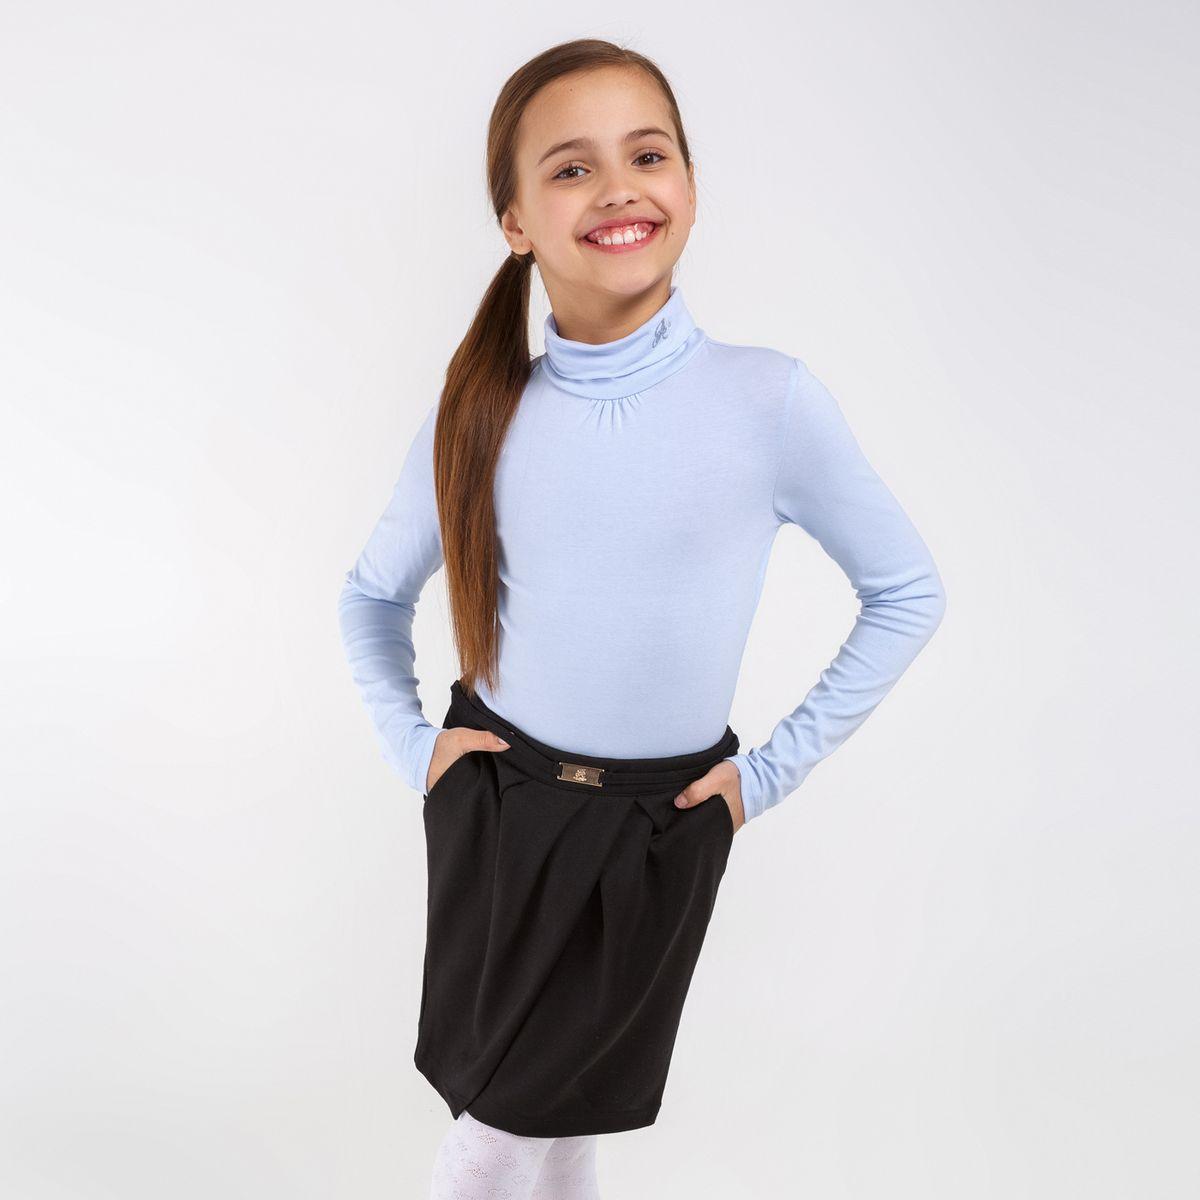 Джемпер для девочки Leirvic_ind. 2021010003920210100039_4400